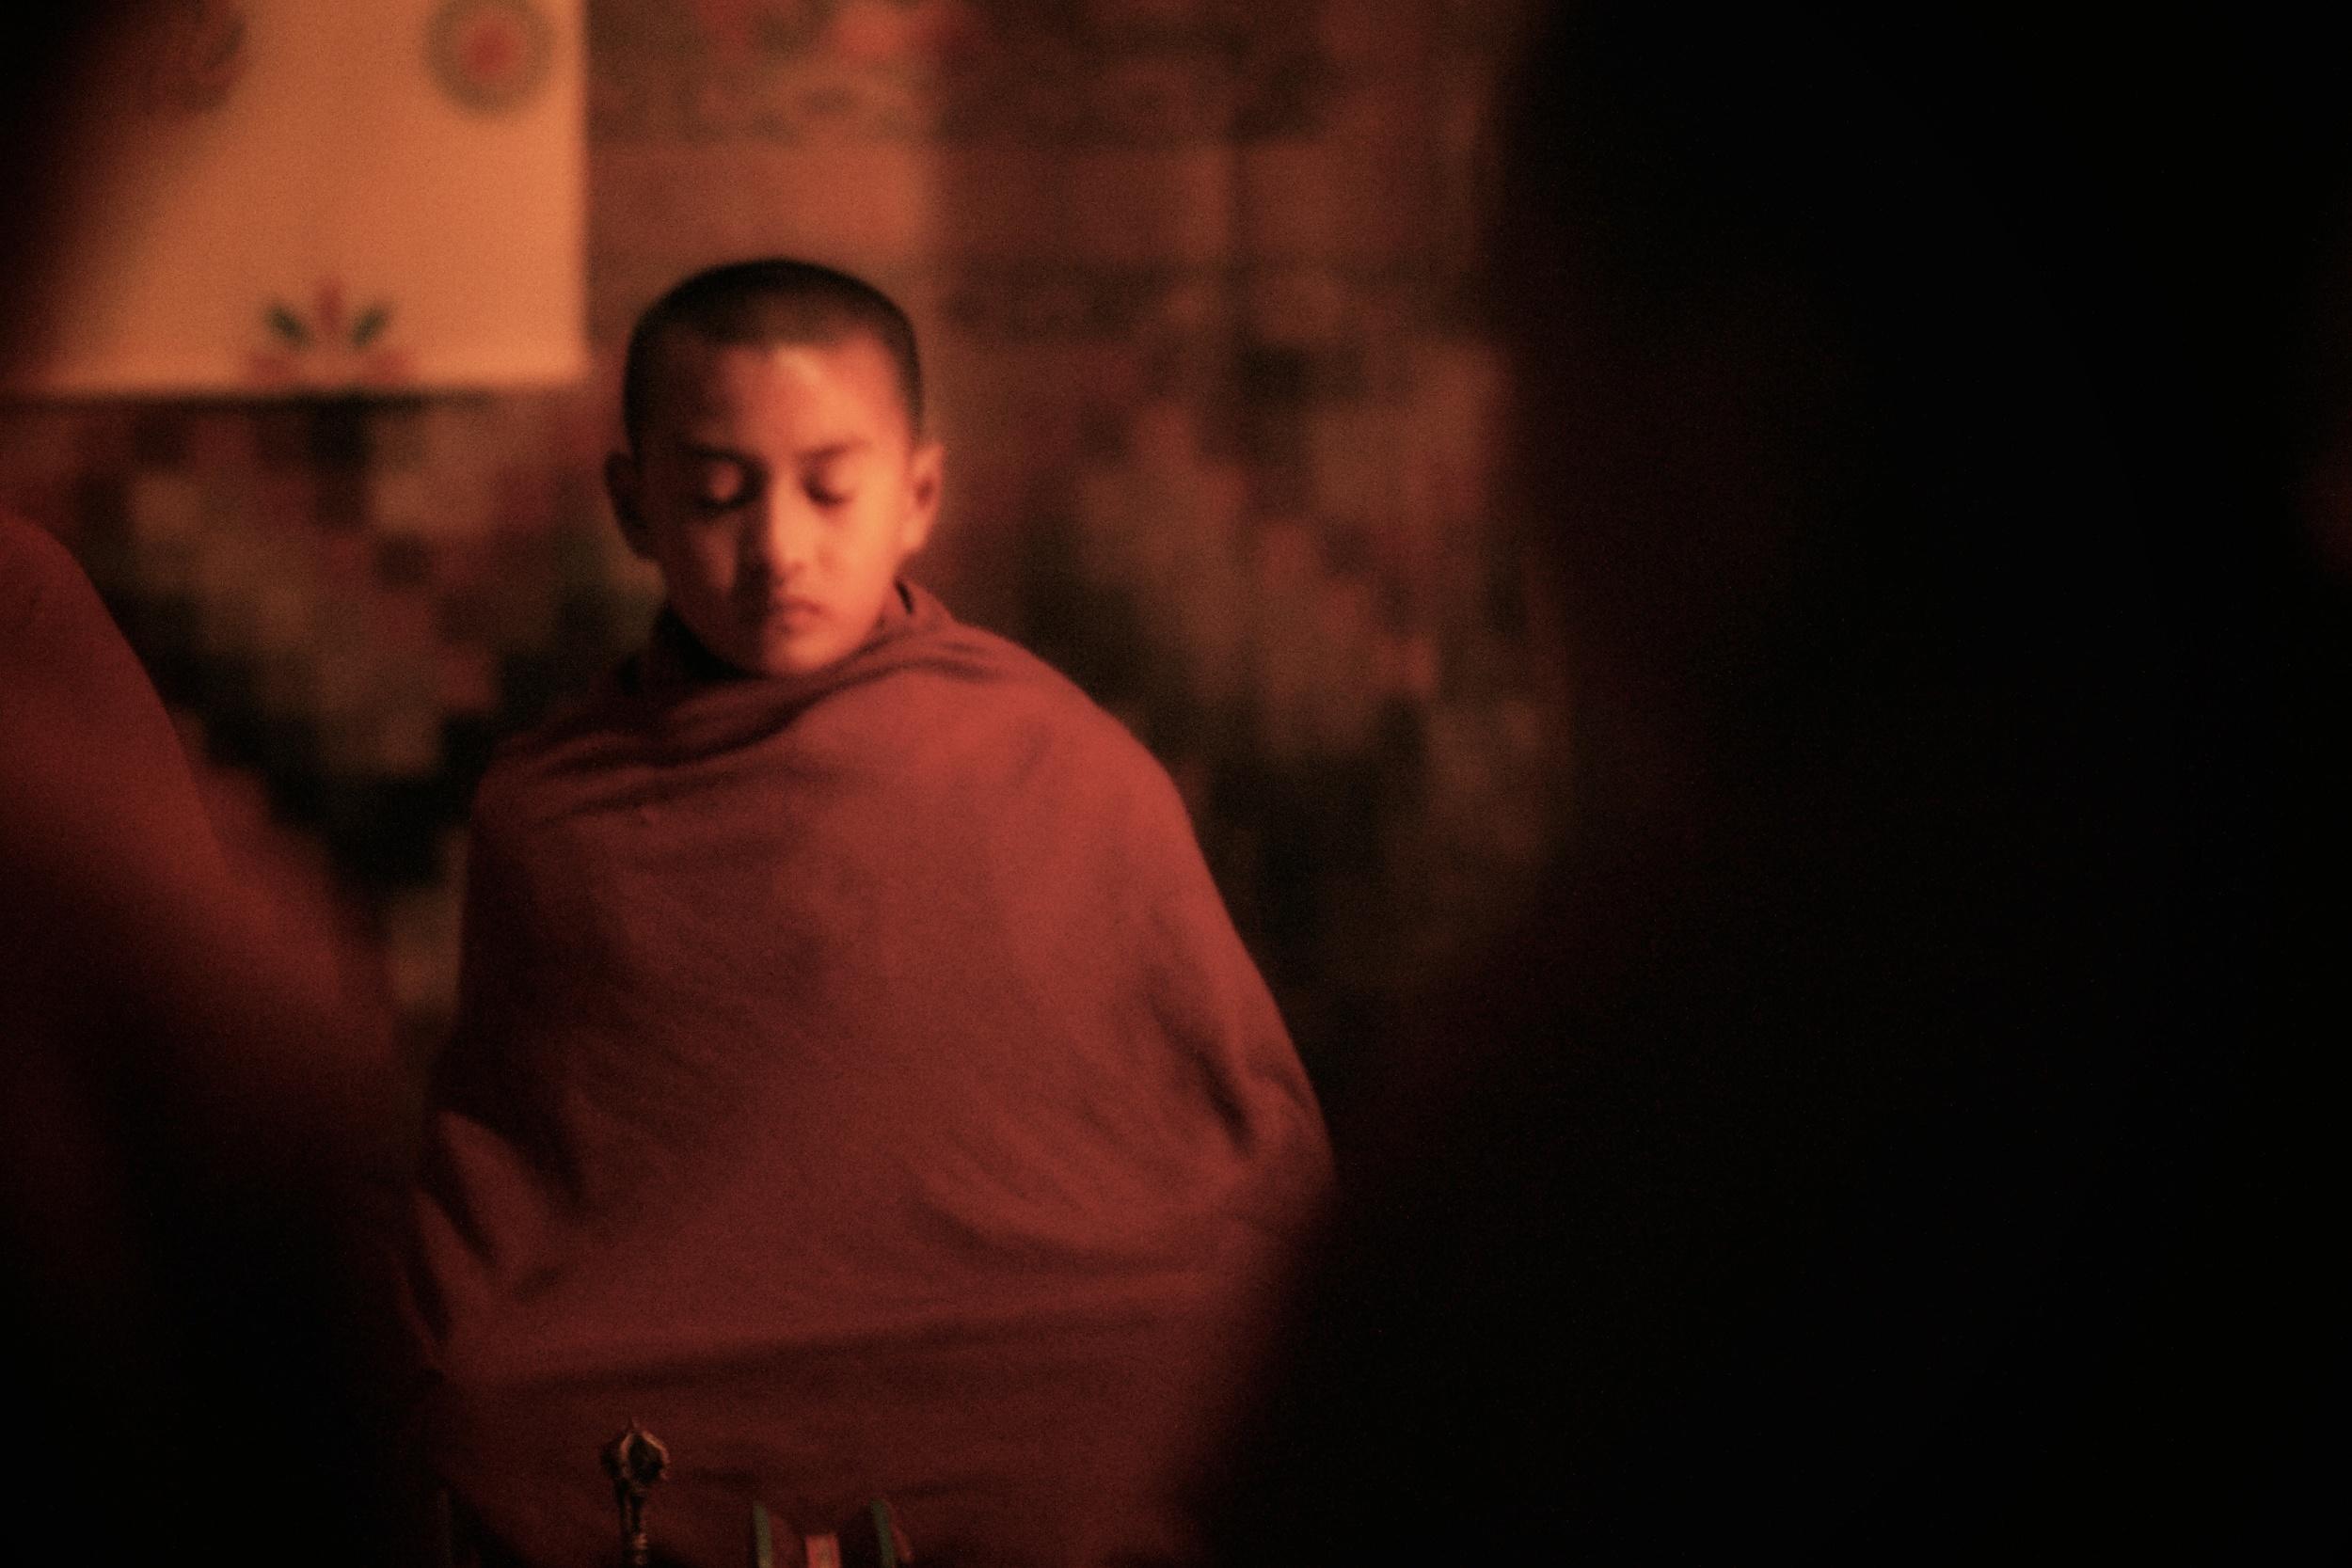 Monk at prayer.jpg